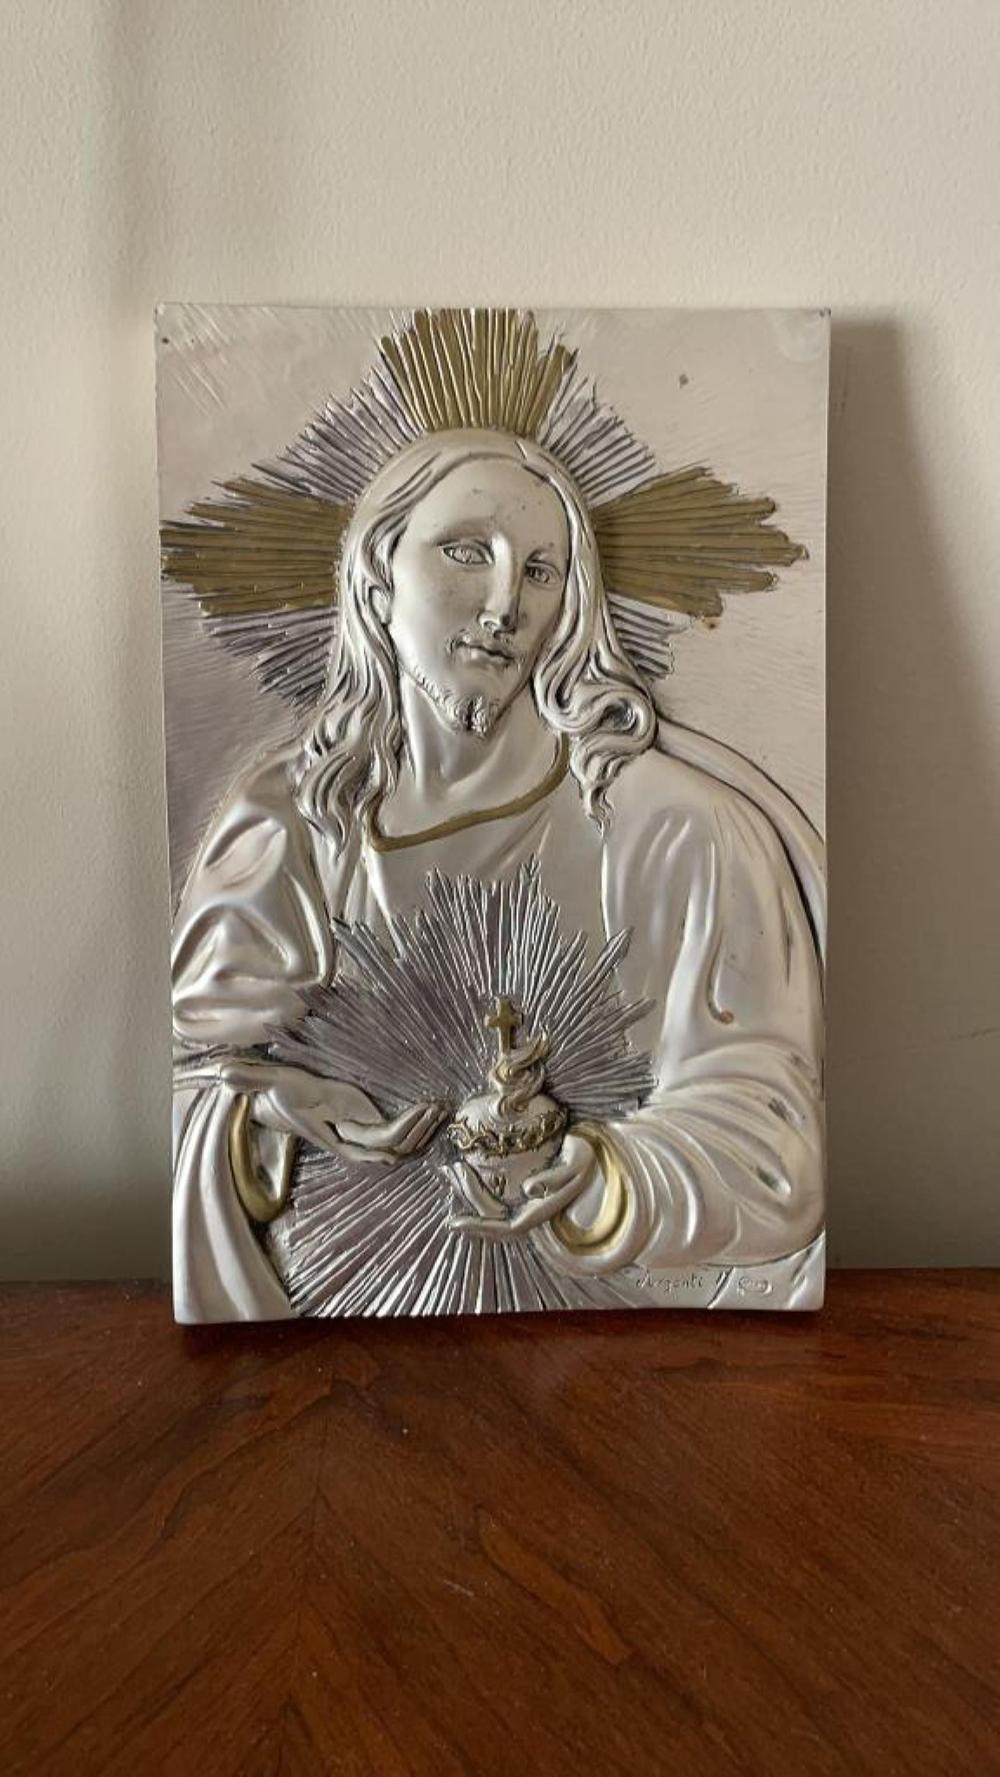 "Argenti silver overlay plaque of Jesus 12"" x 12"" x 7.25"""